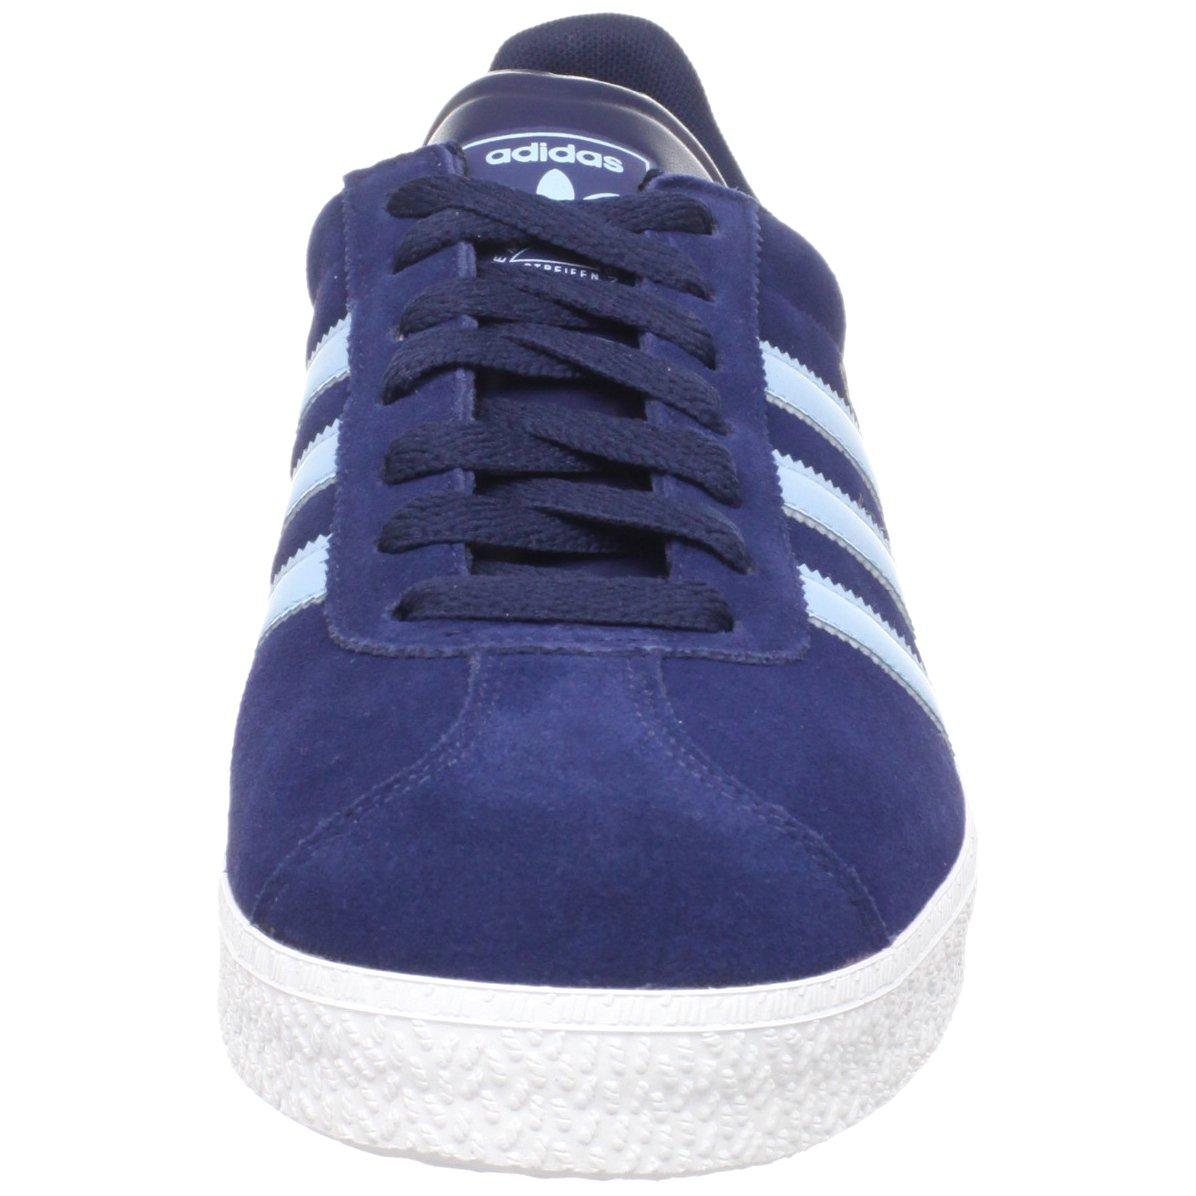 b846118cd049 Adidas Originals Men s Gazelle 2 Suede Sneaker